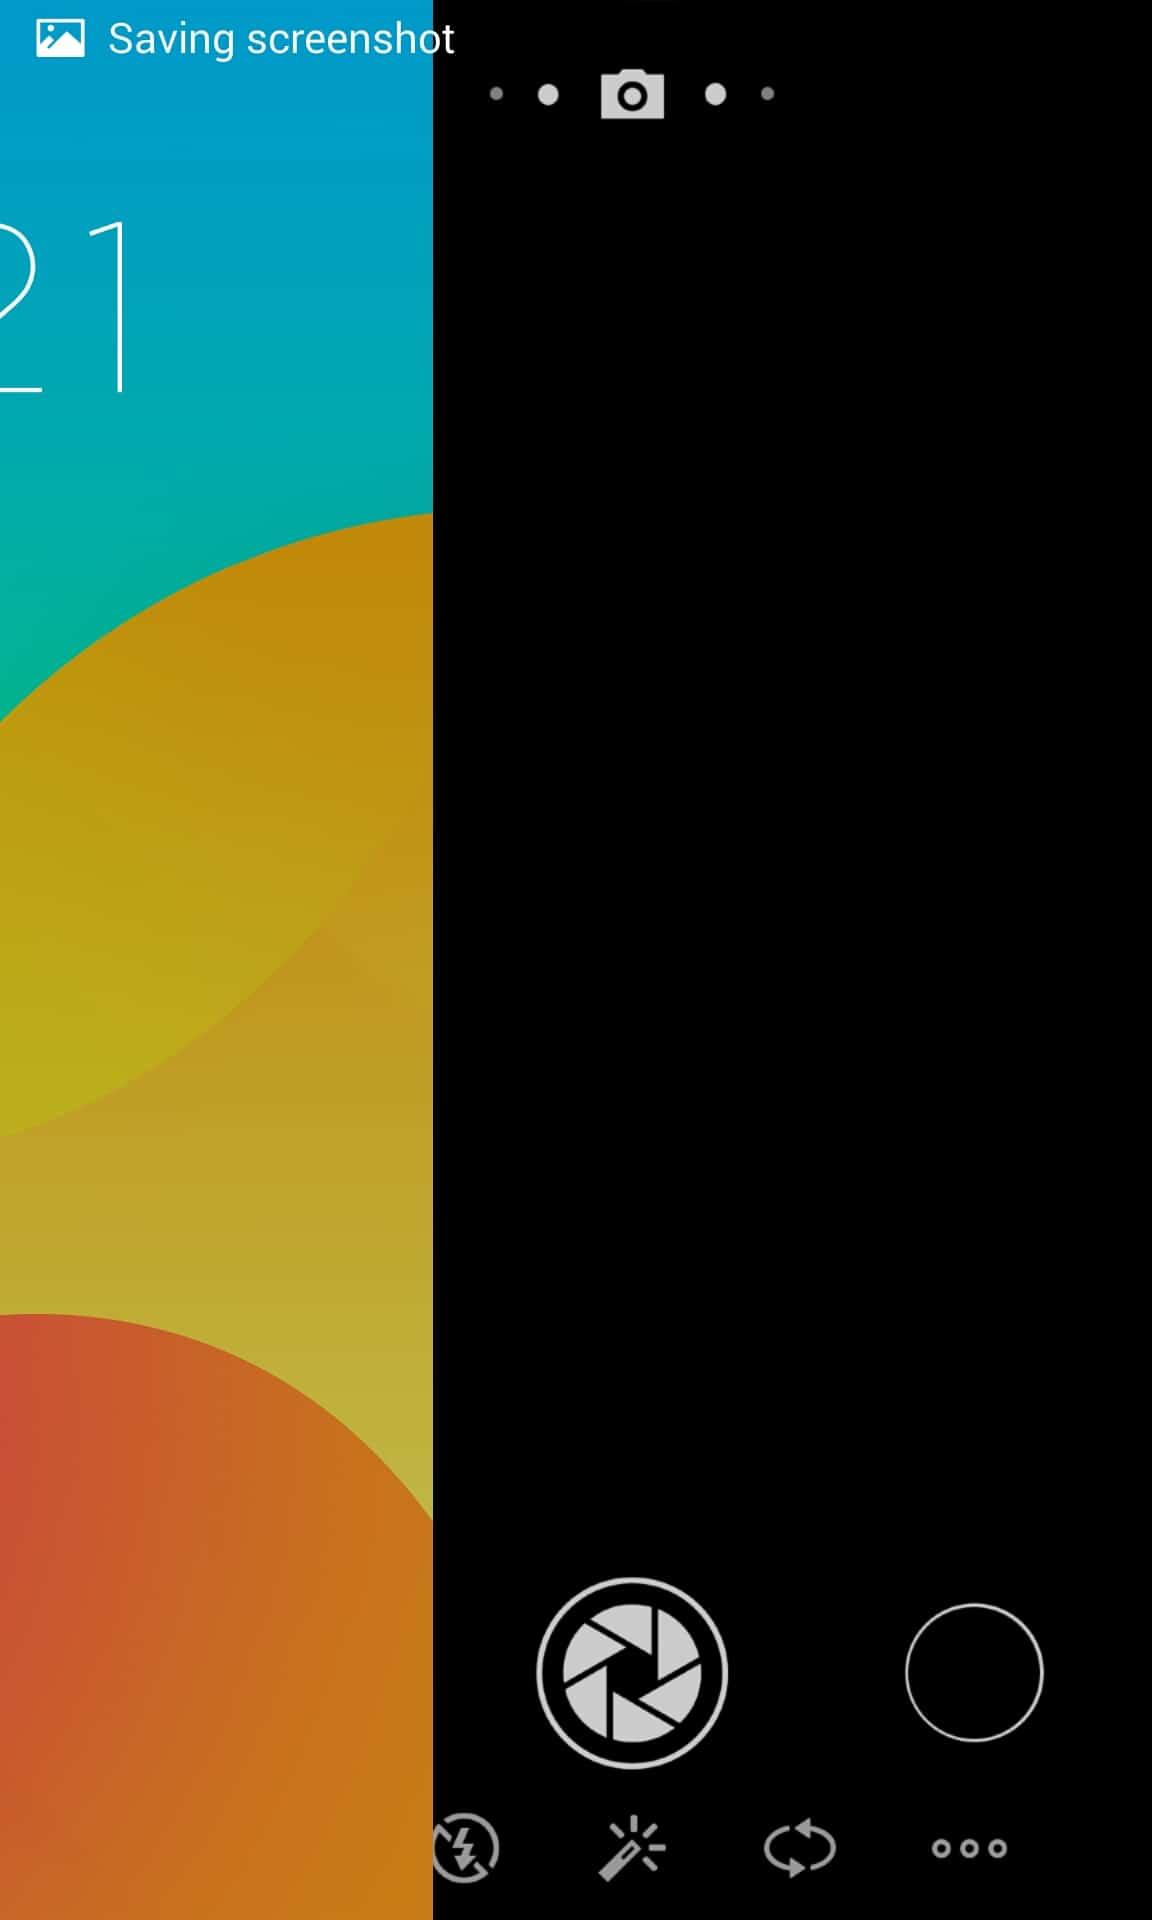 Meizu mx4 lockscreen 2